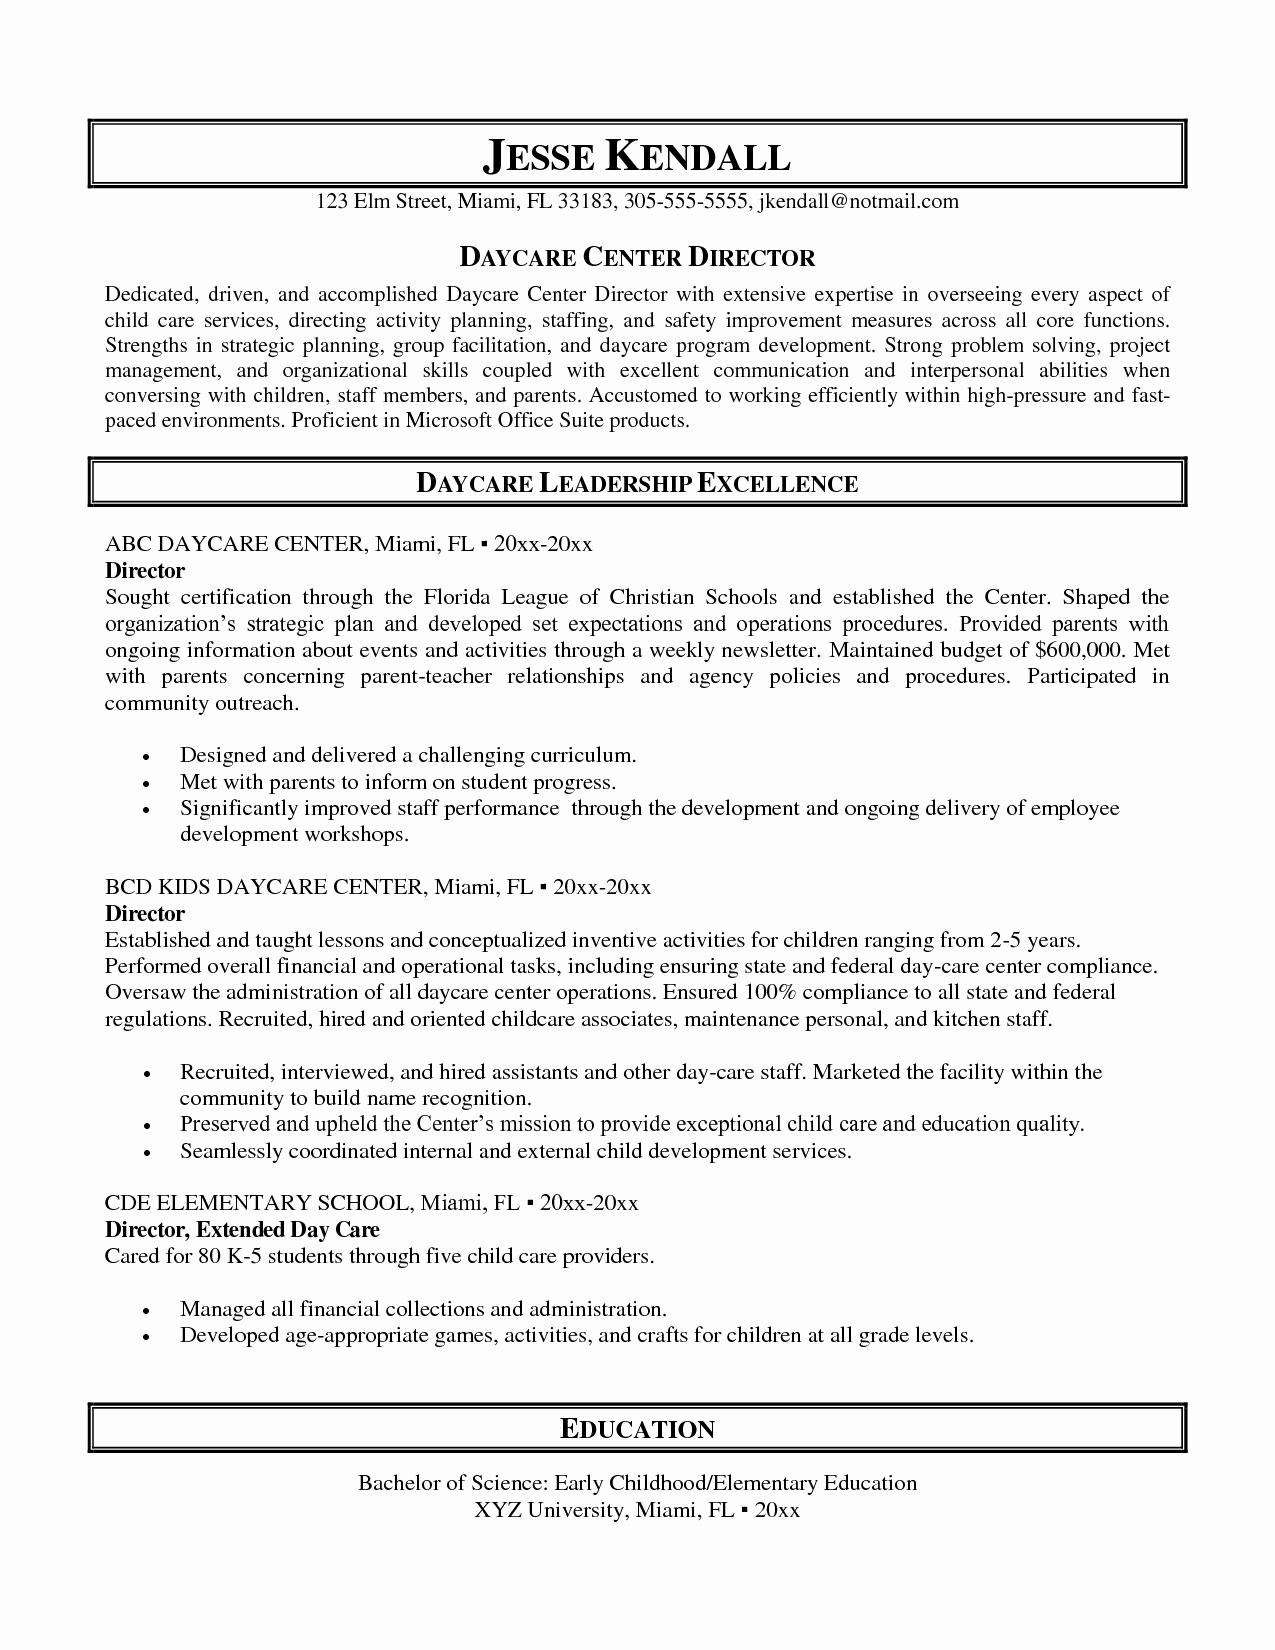 Child Care Resume Template Unique Impressive Sample Resume for Daycare Worker Also Child